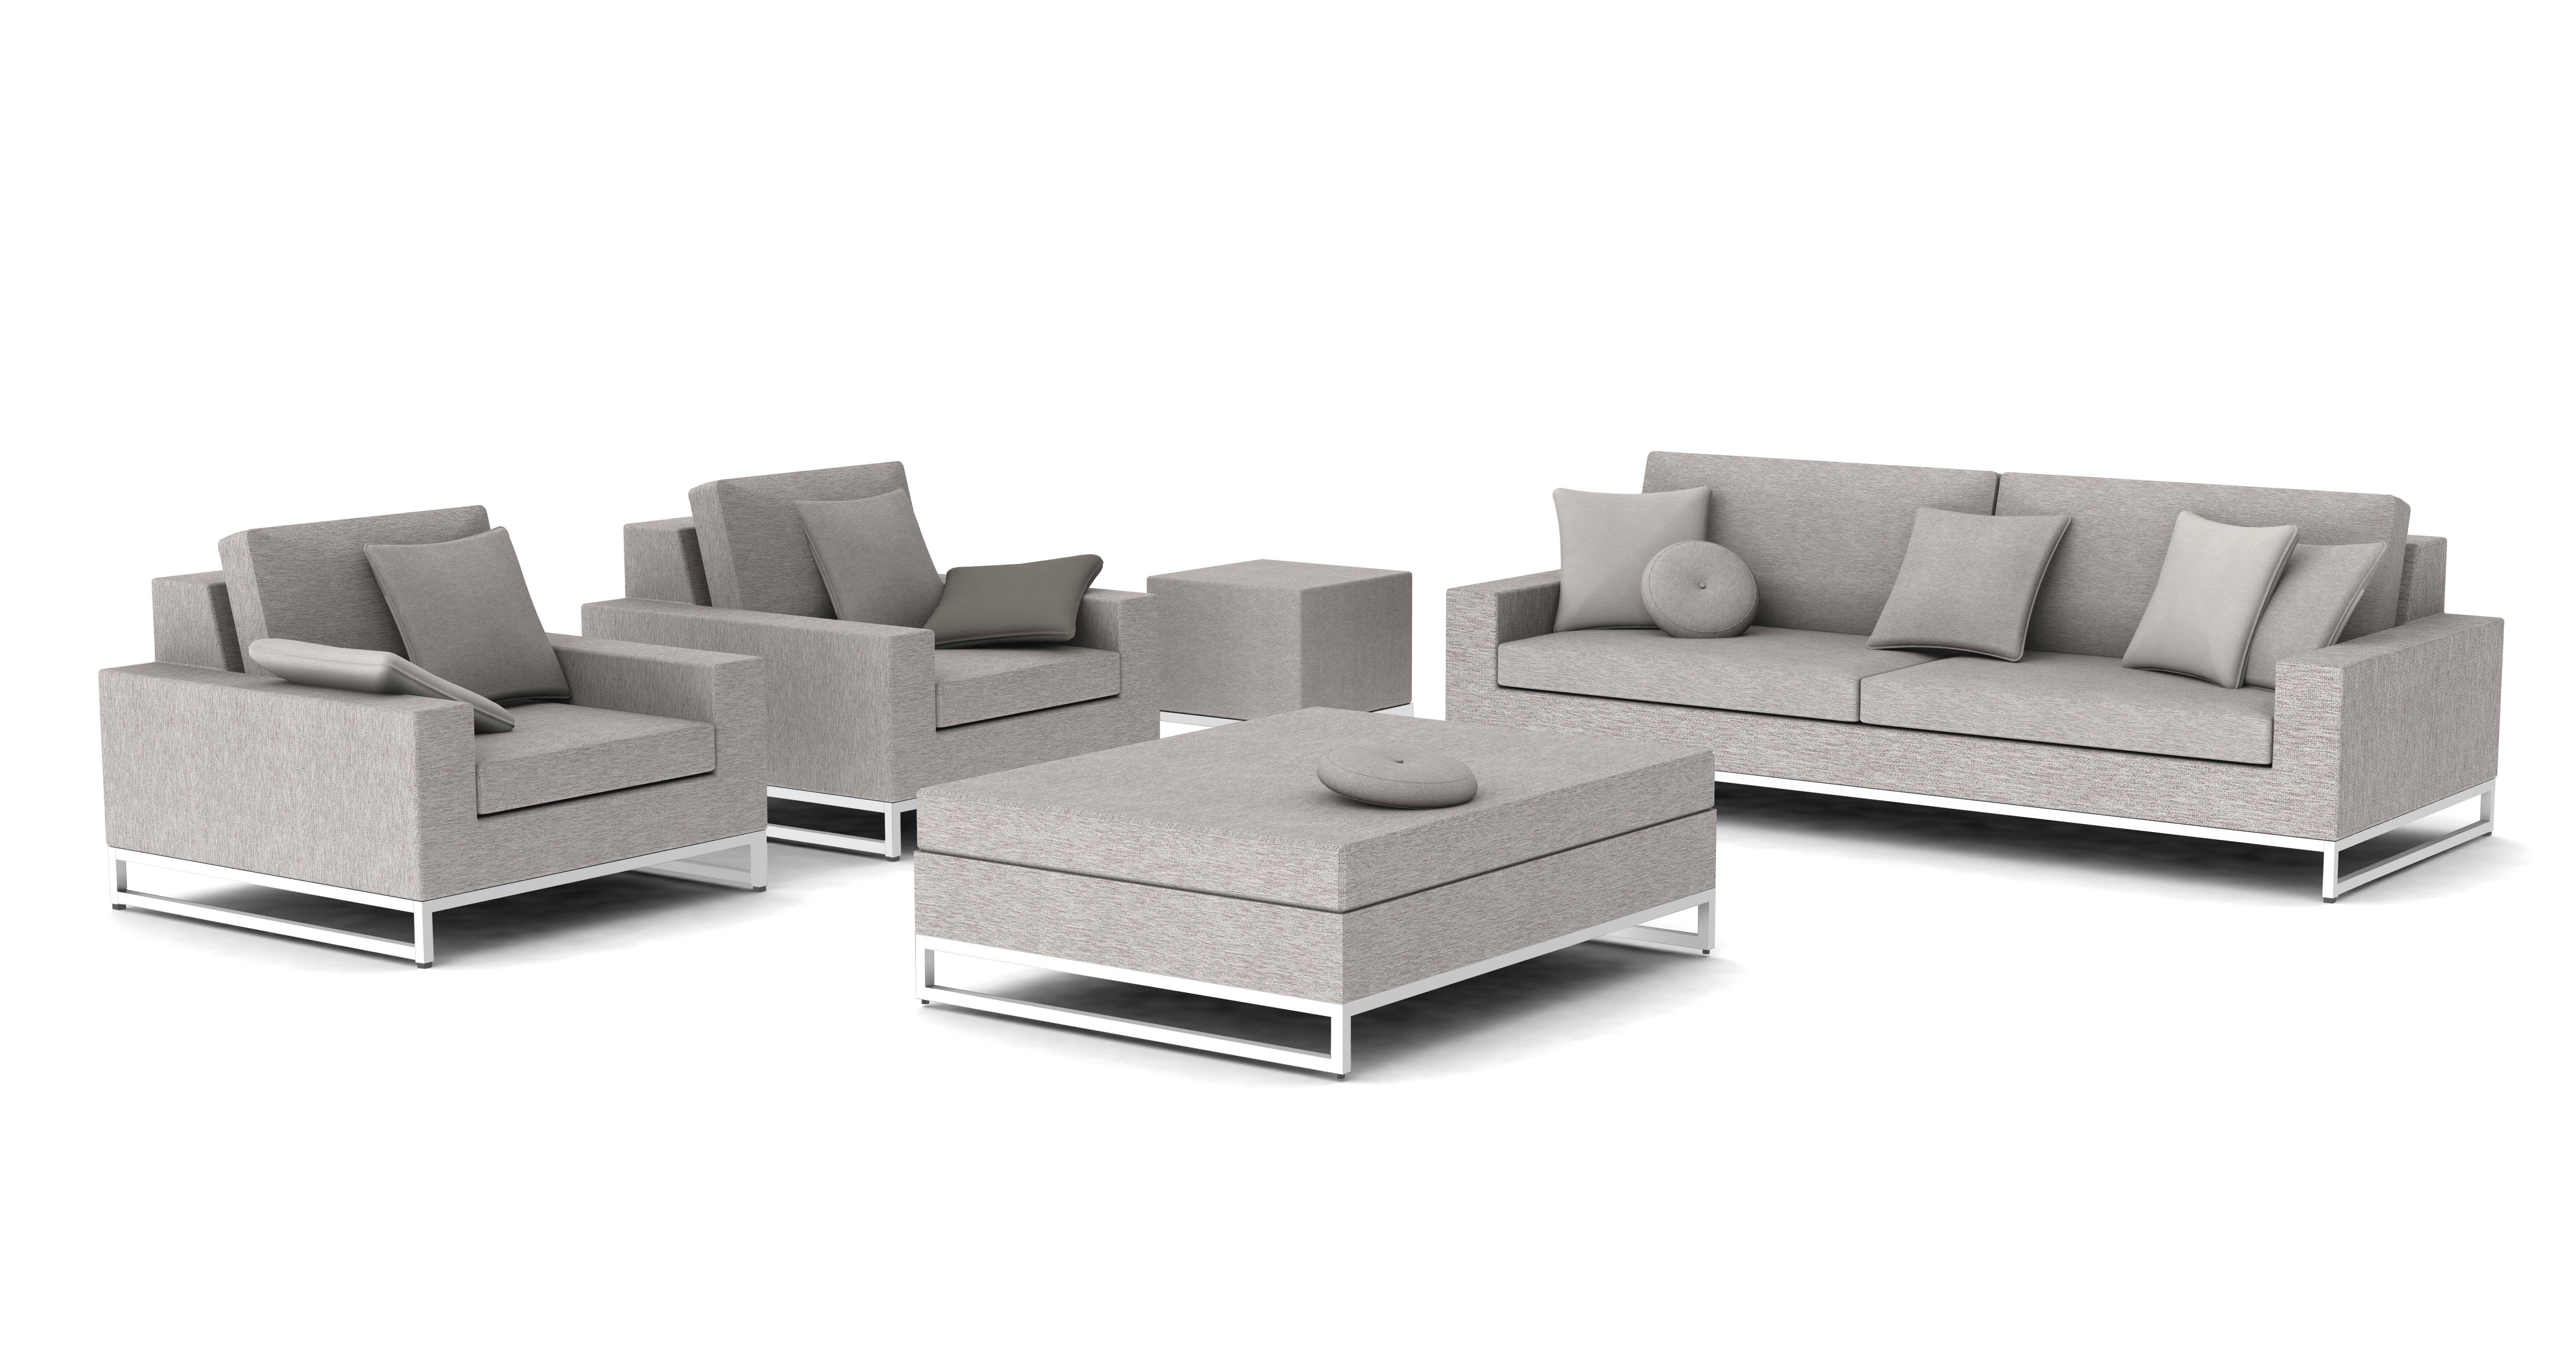 Lounger Sofa Modular Sofa Outdoor Sofa Sets Sofa Upholstery